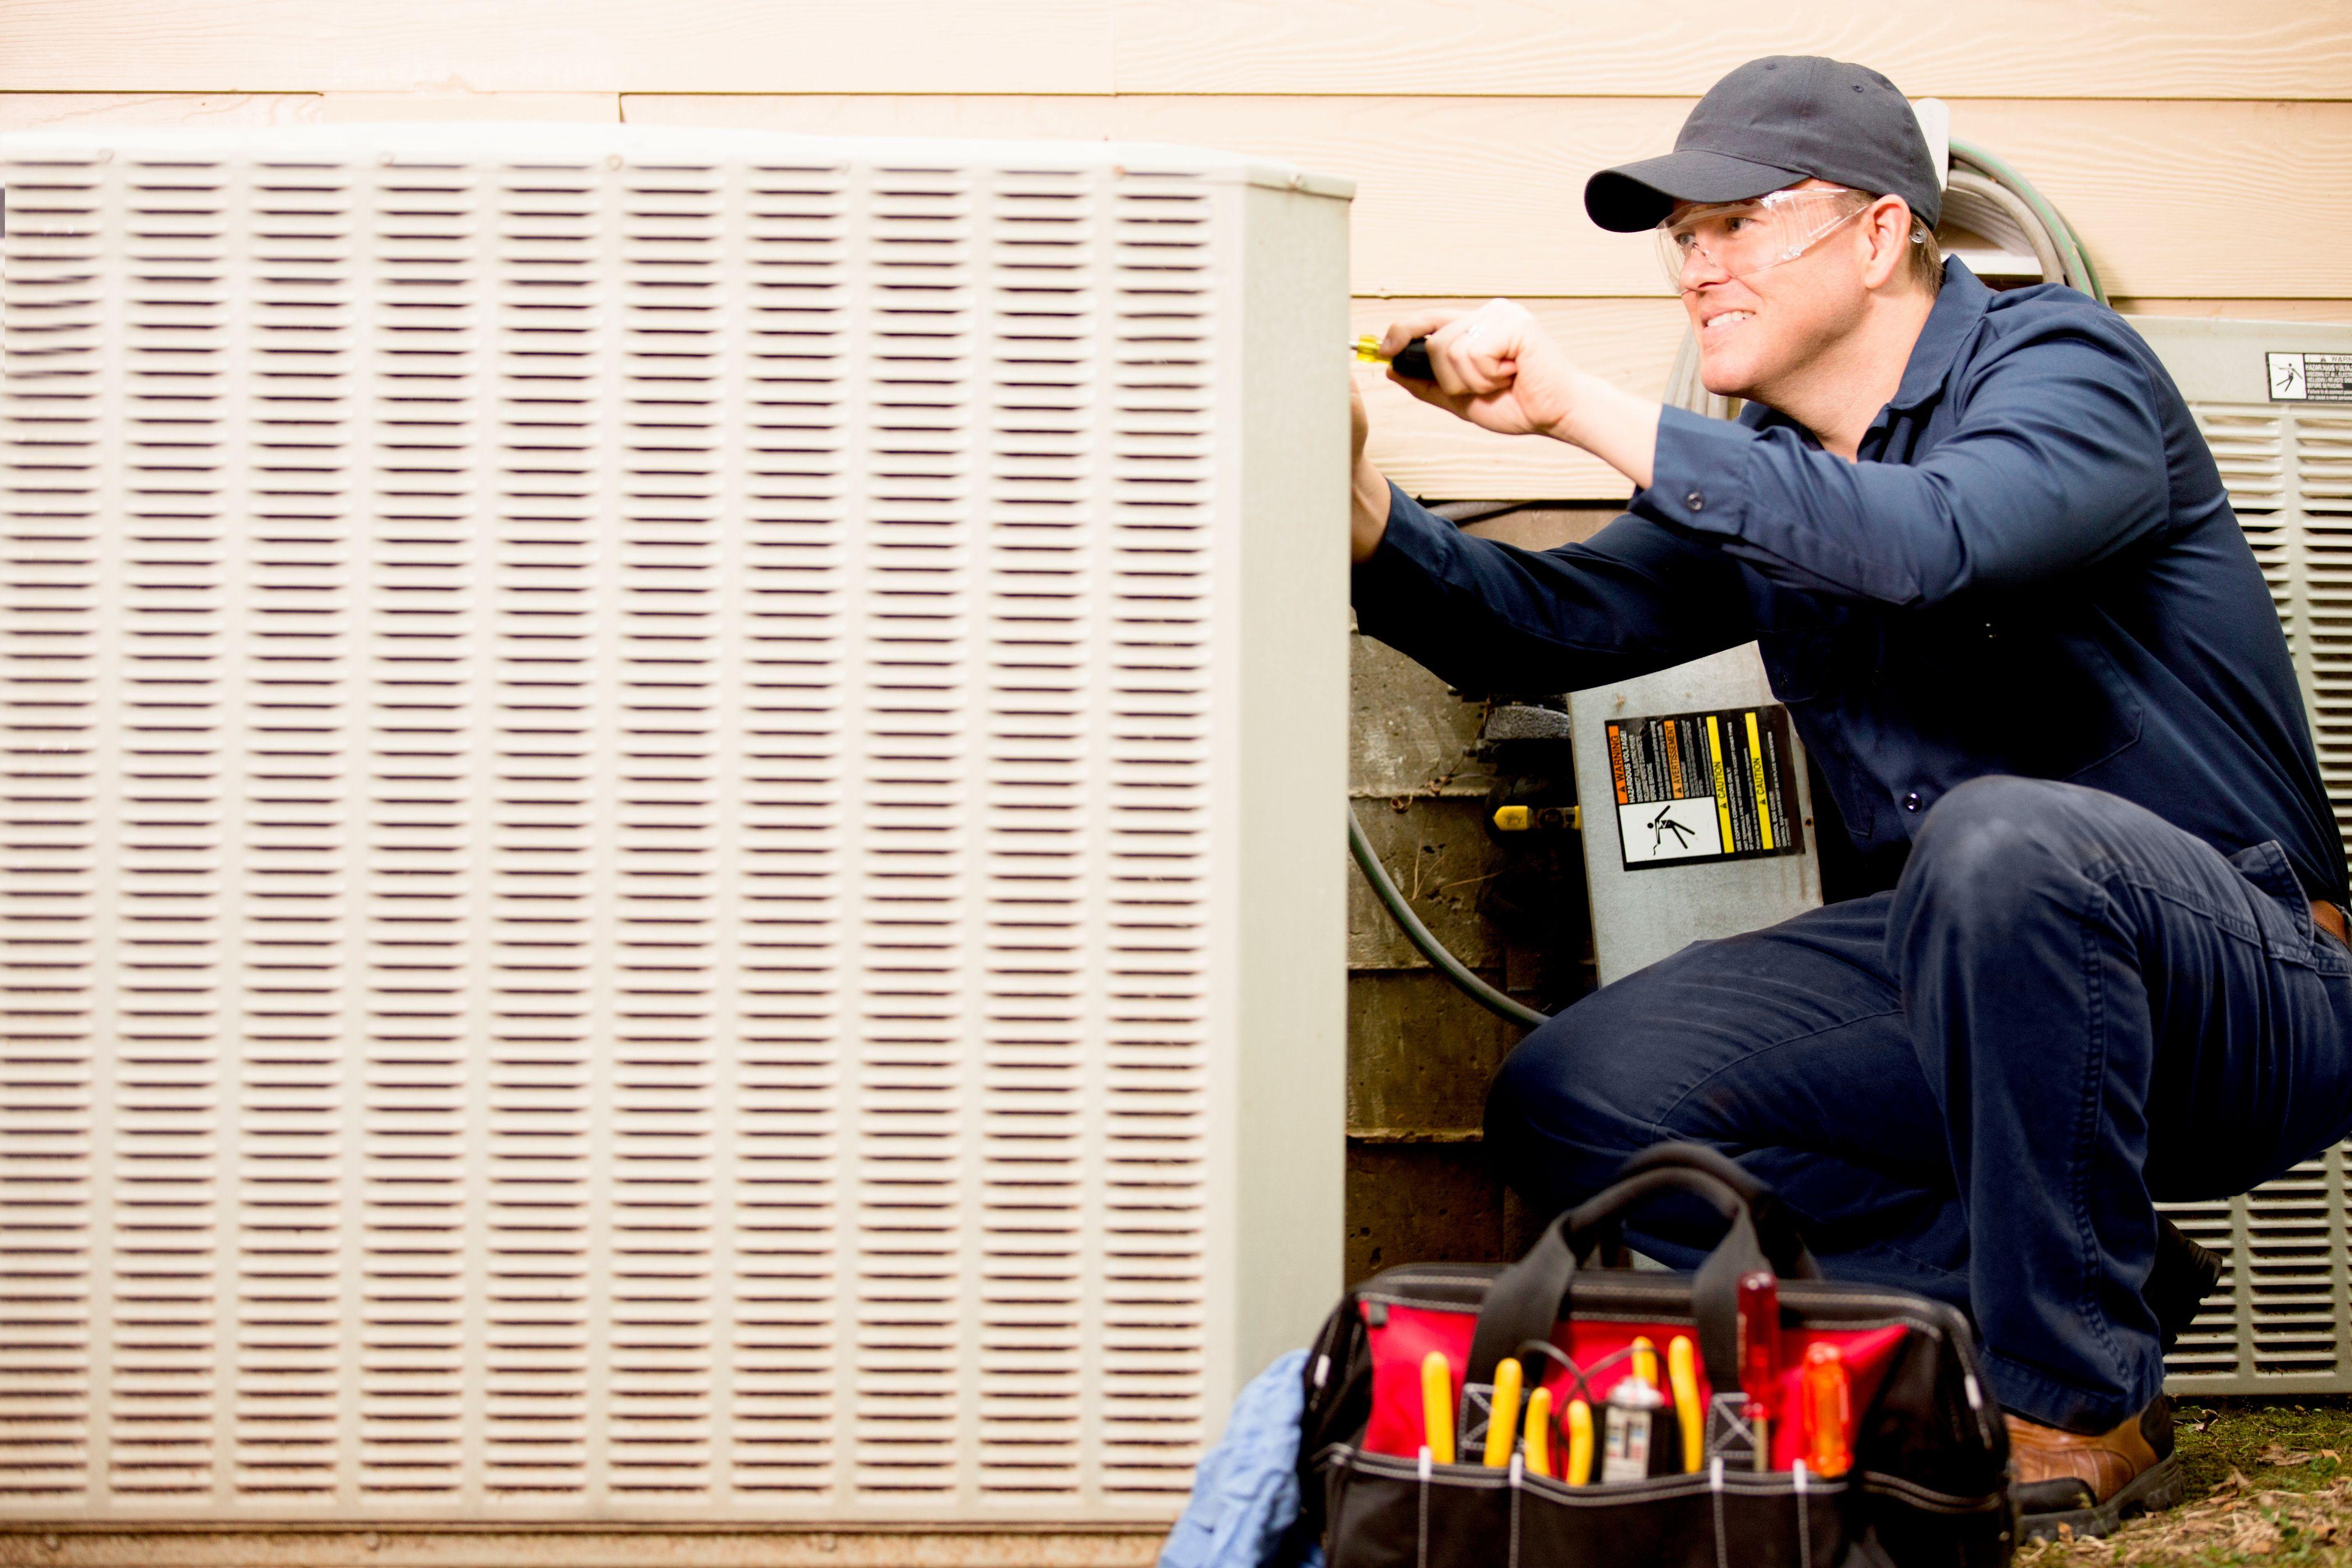 HVAC technician working on AC